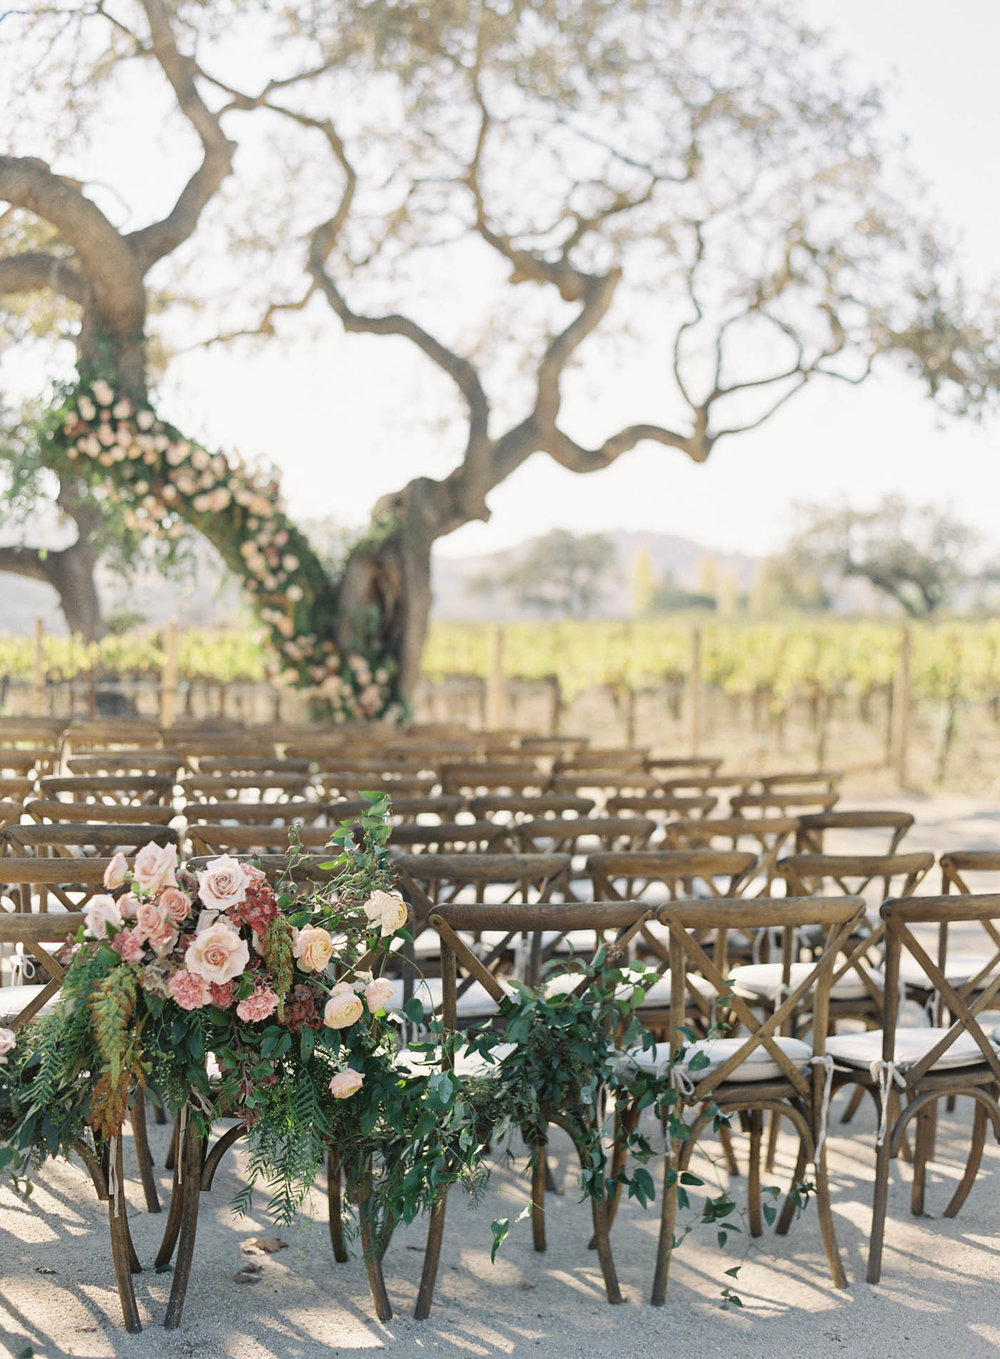 sunstone-villa-wedding-13-Jen_Huang-RD-51-Jen_Huang-009589-R1-003.jpg